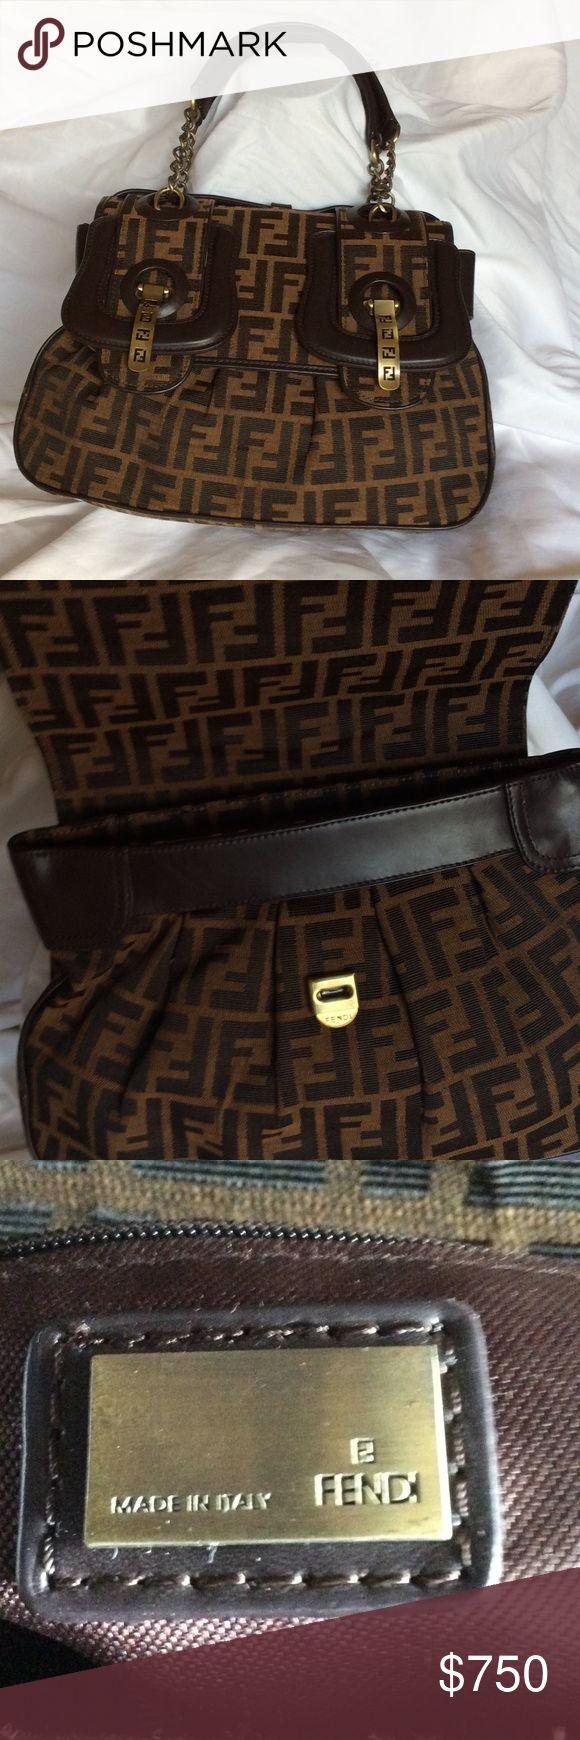 802840e6e490 sale fendi handbag authenticity stickers 7fd98 1ec8c